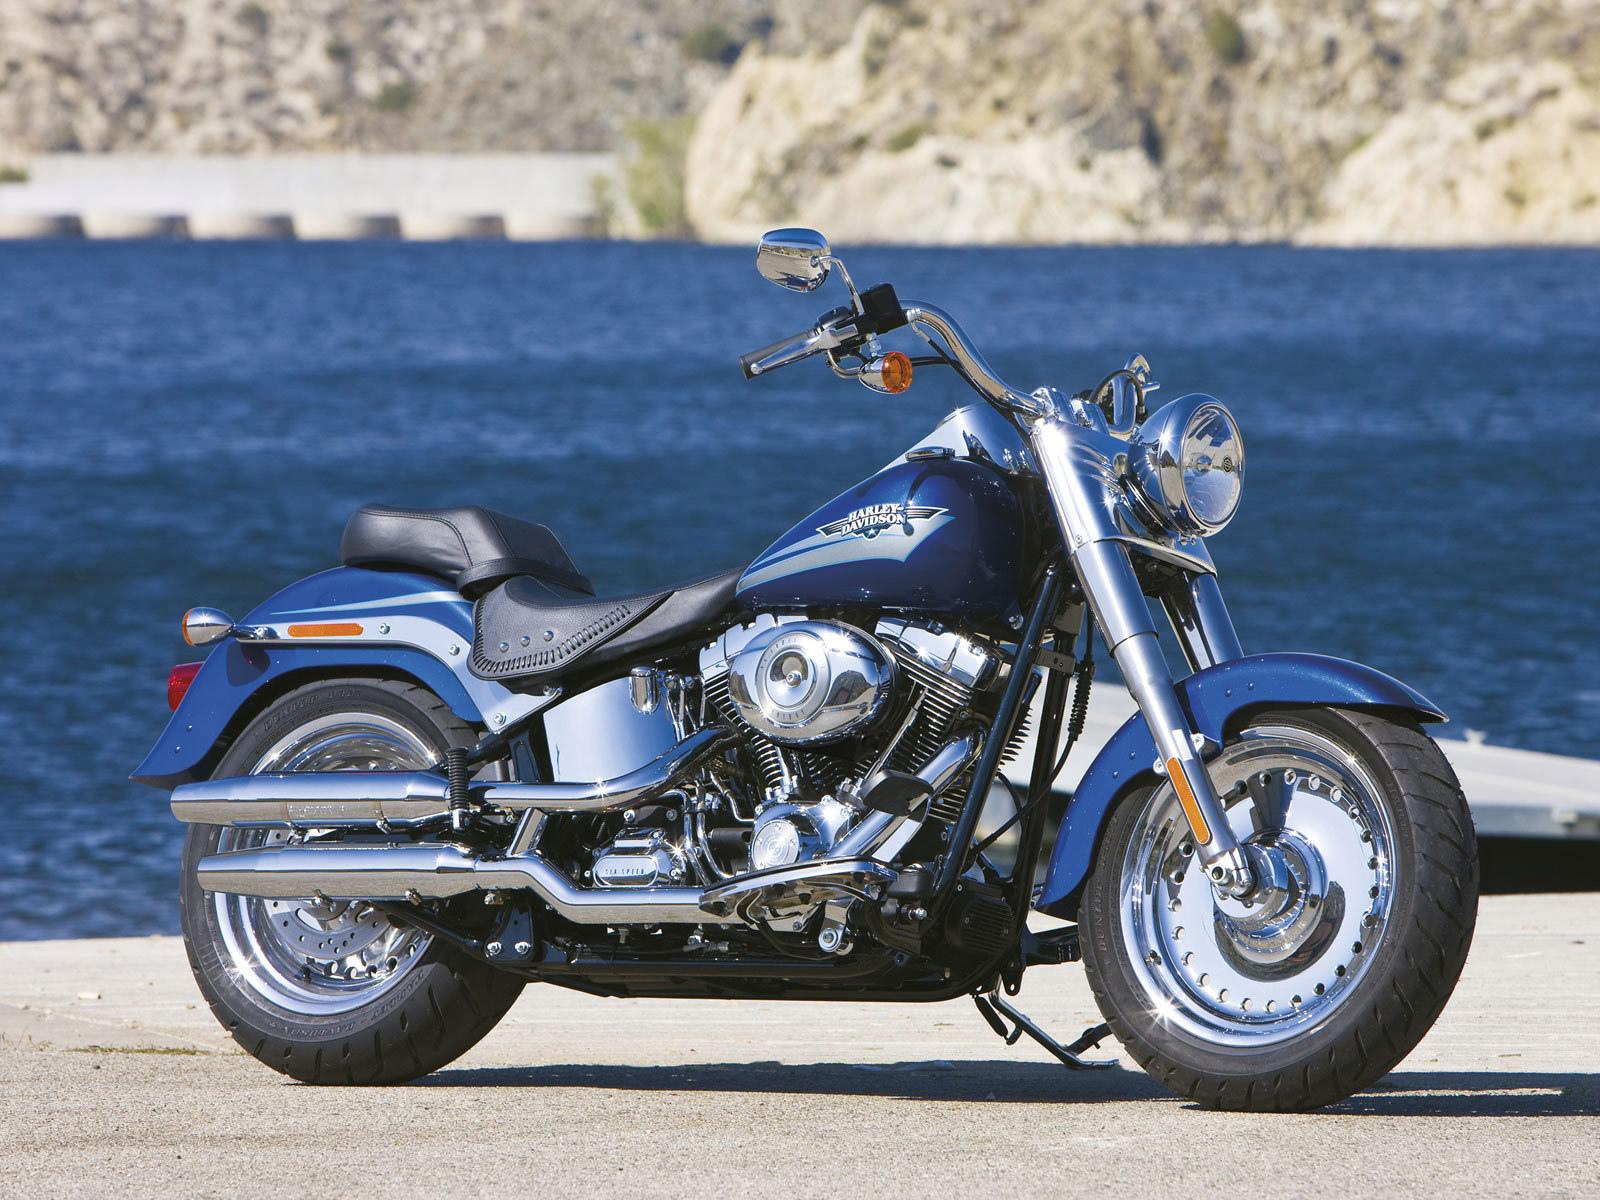 Harley-Davidson Fat Boy wallpapers HD quality